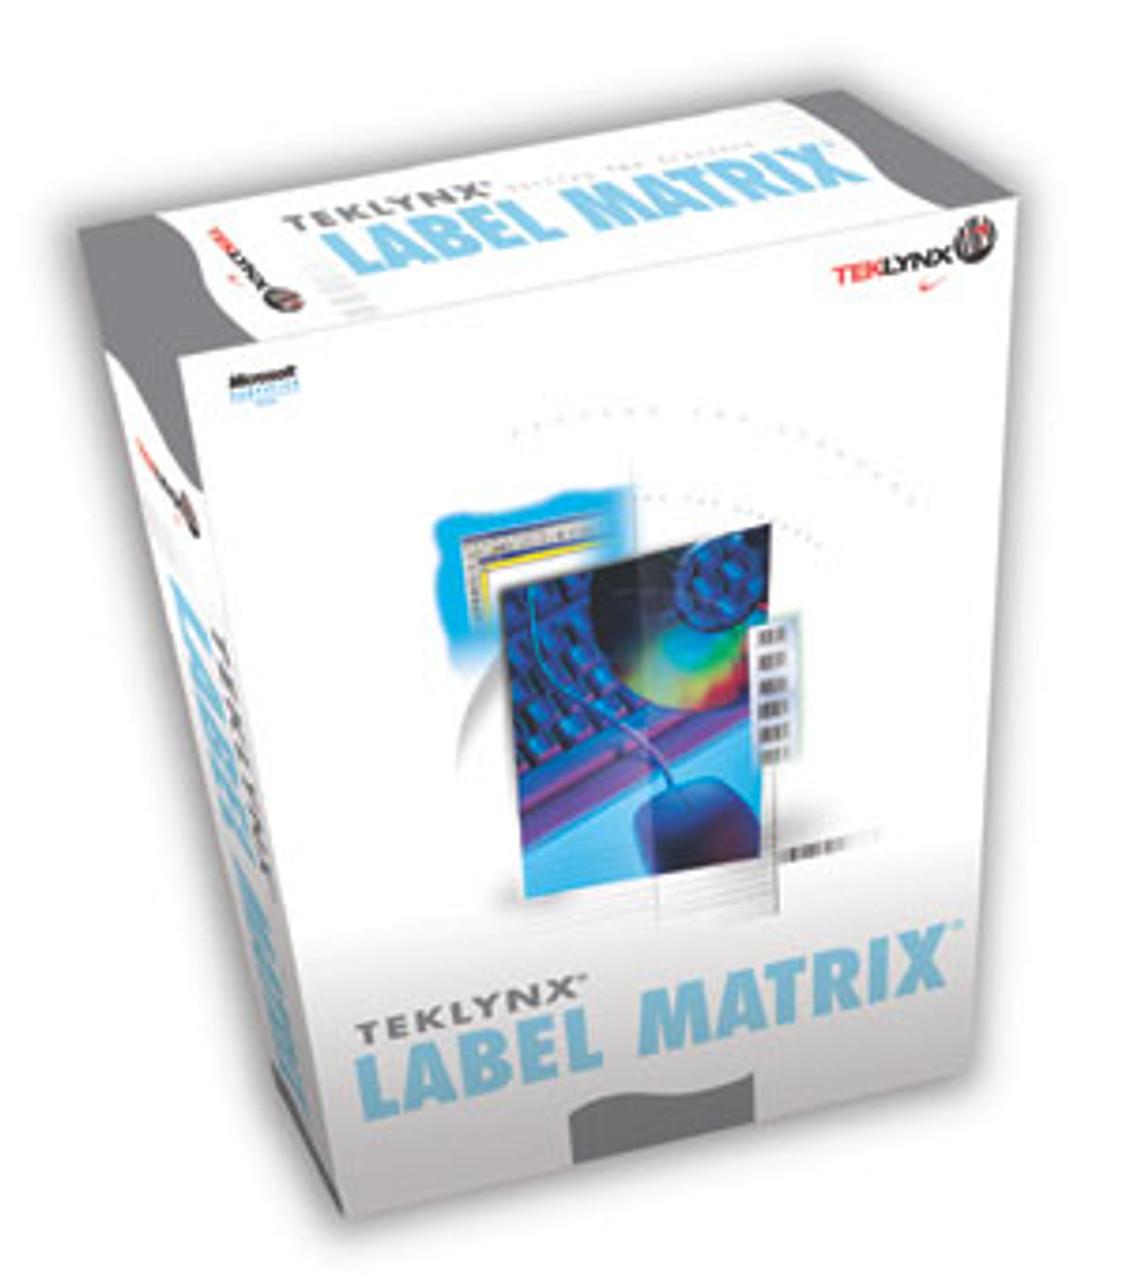 LABEL MATRIX QuickDraw Barcode Label Software